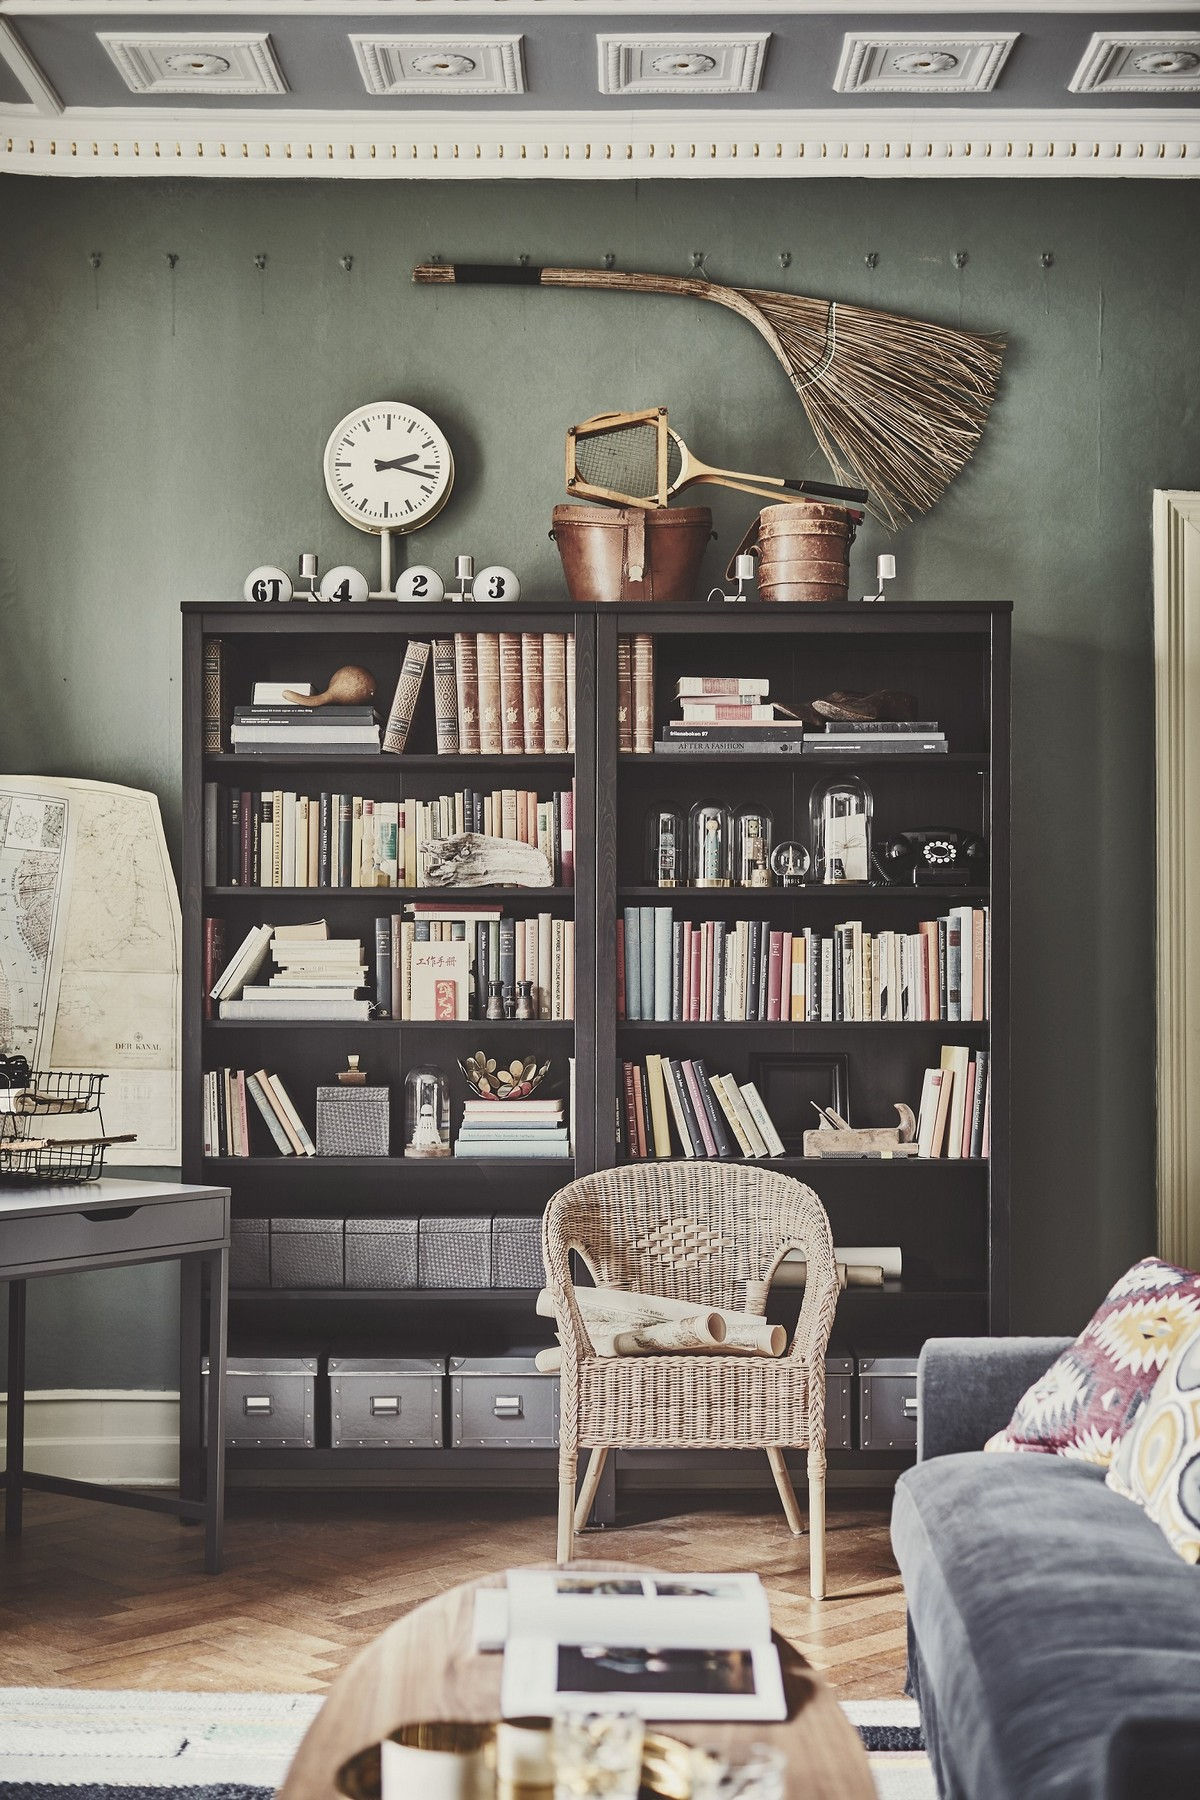 Ikea catalogo 2019 novit foto sette case diverse for Case arredate ikea